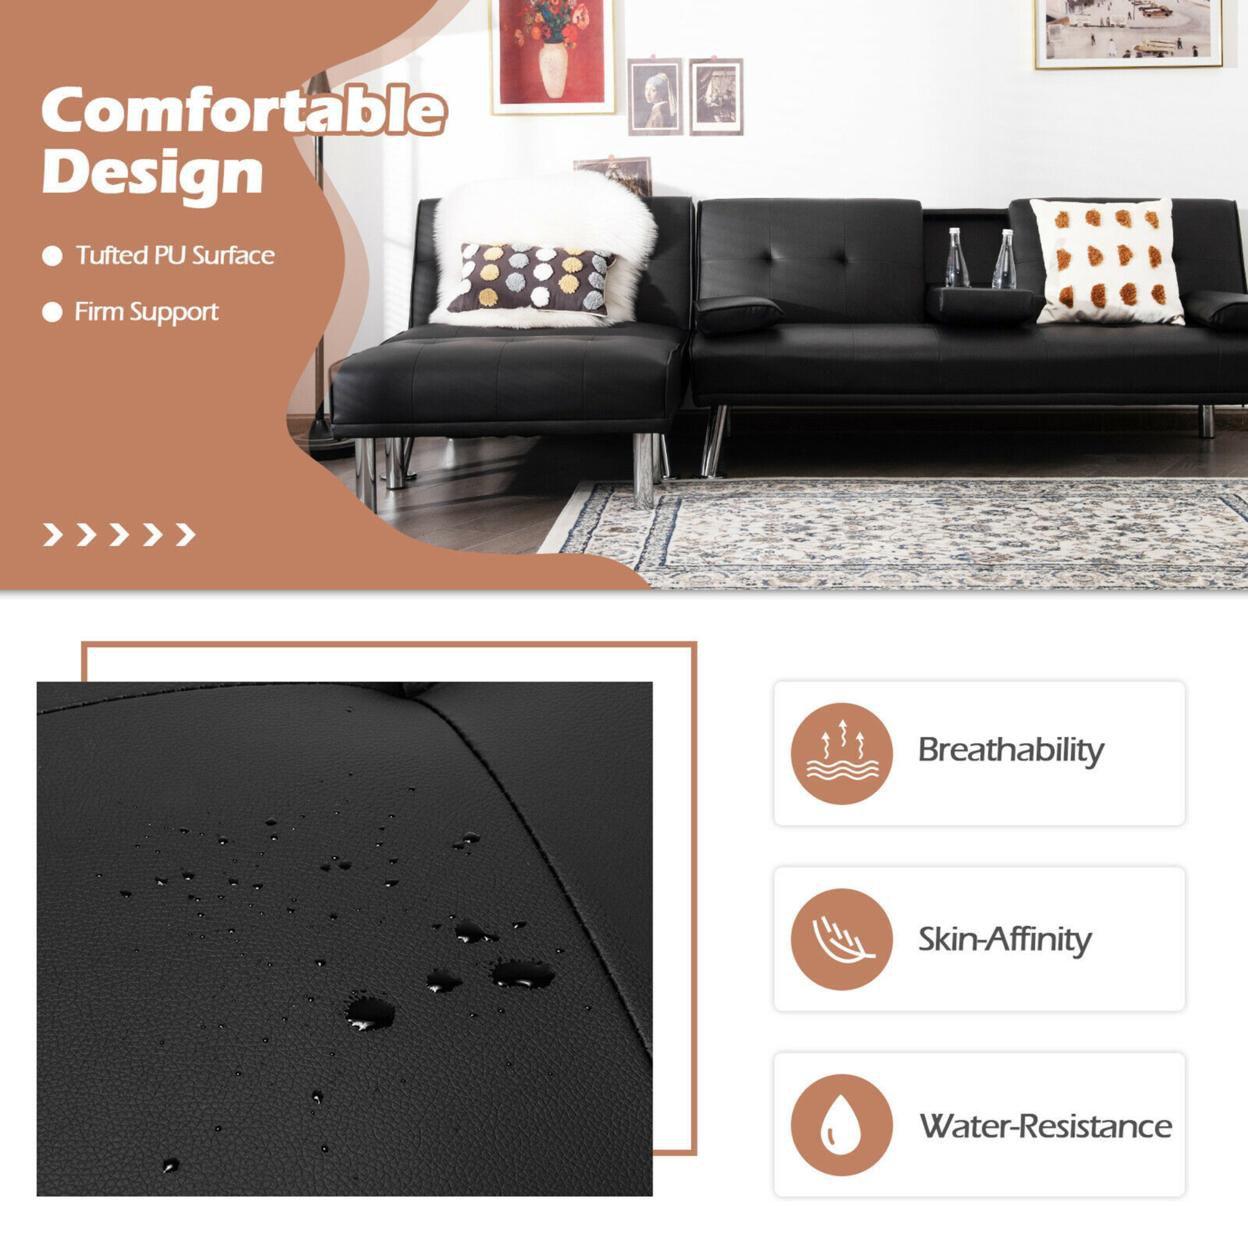 Gymax 3-Piece Sectional Sofa Set Convertible Futon w/Single Sofa & Ottoman Black